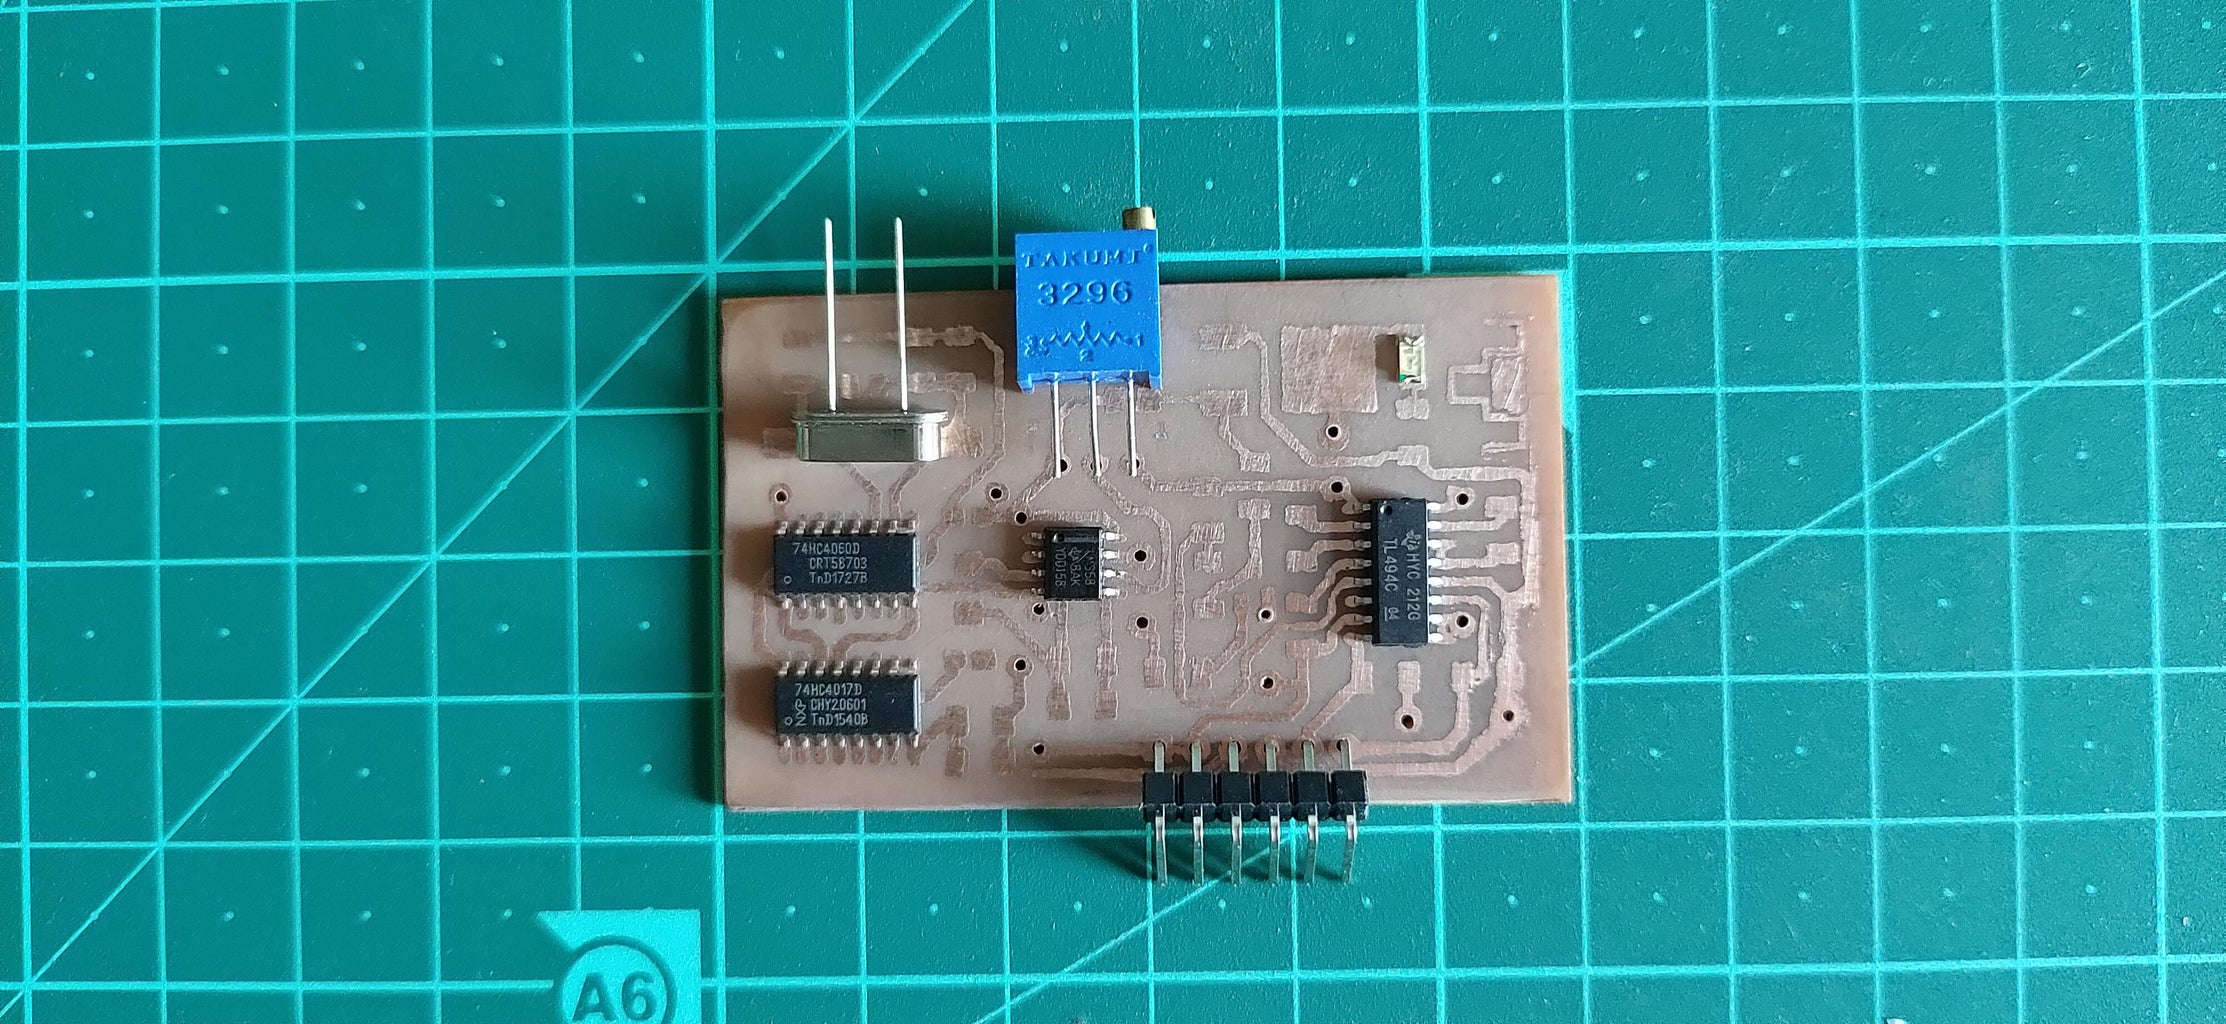 Finishing Up the PCB